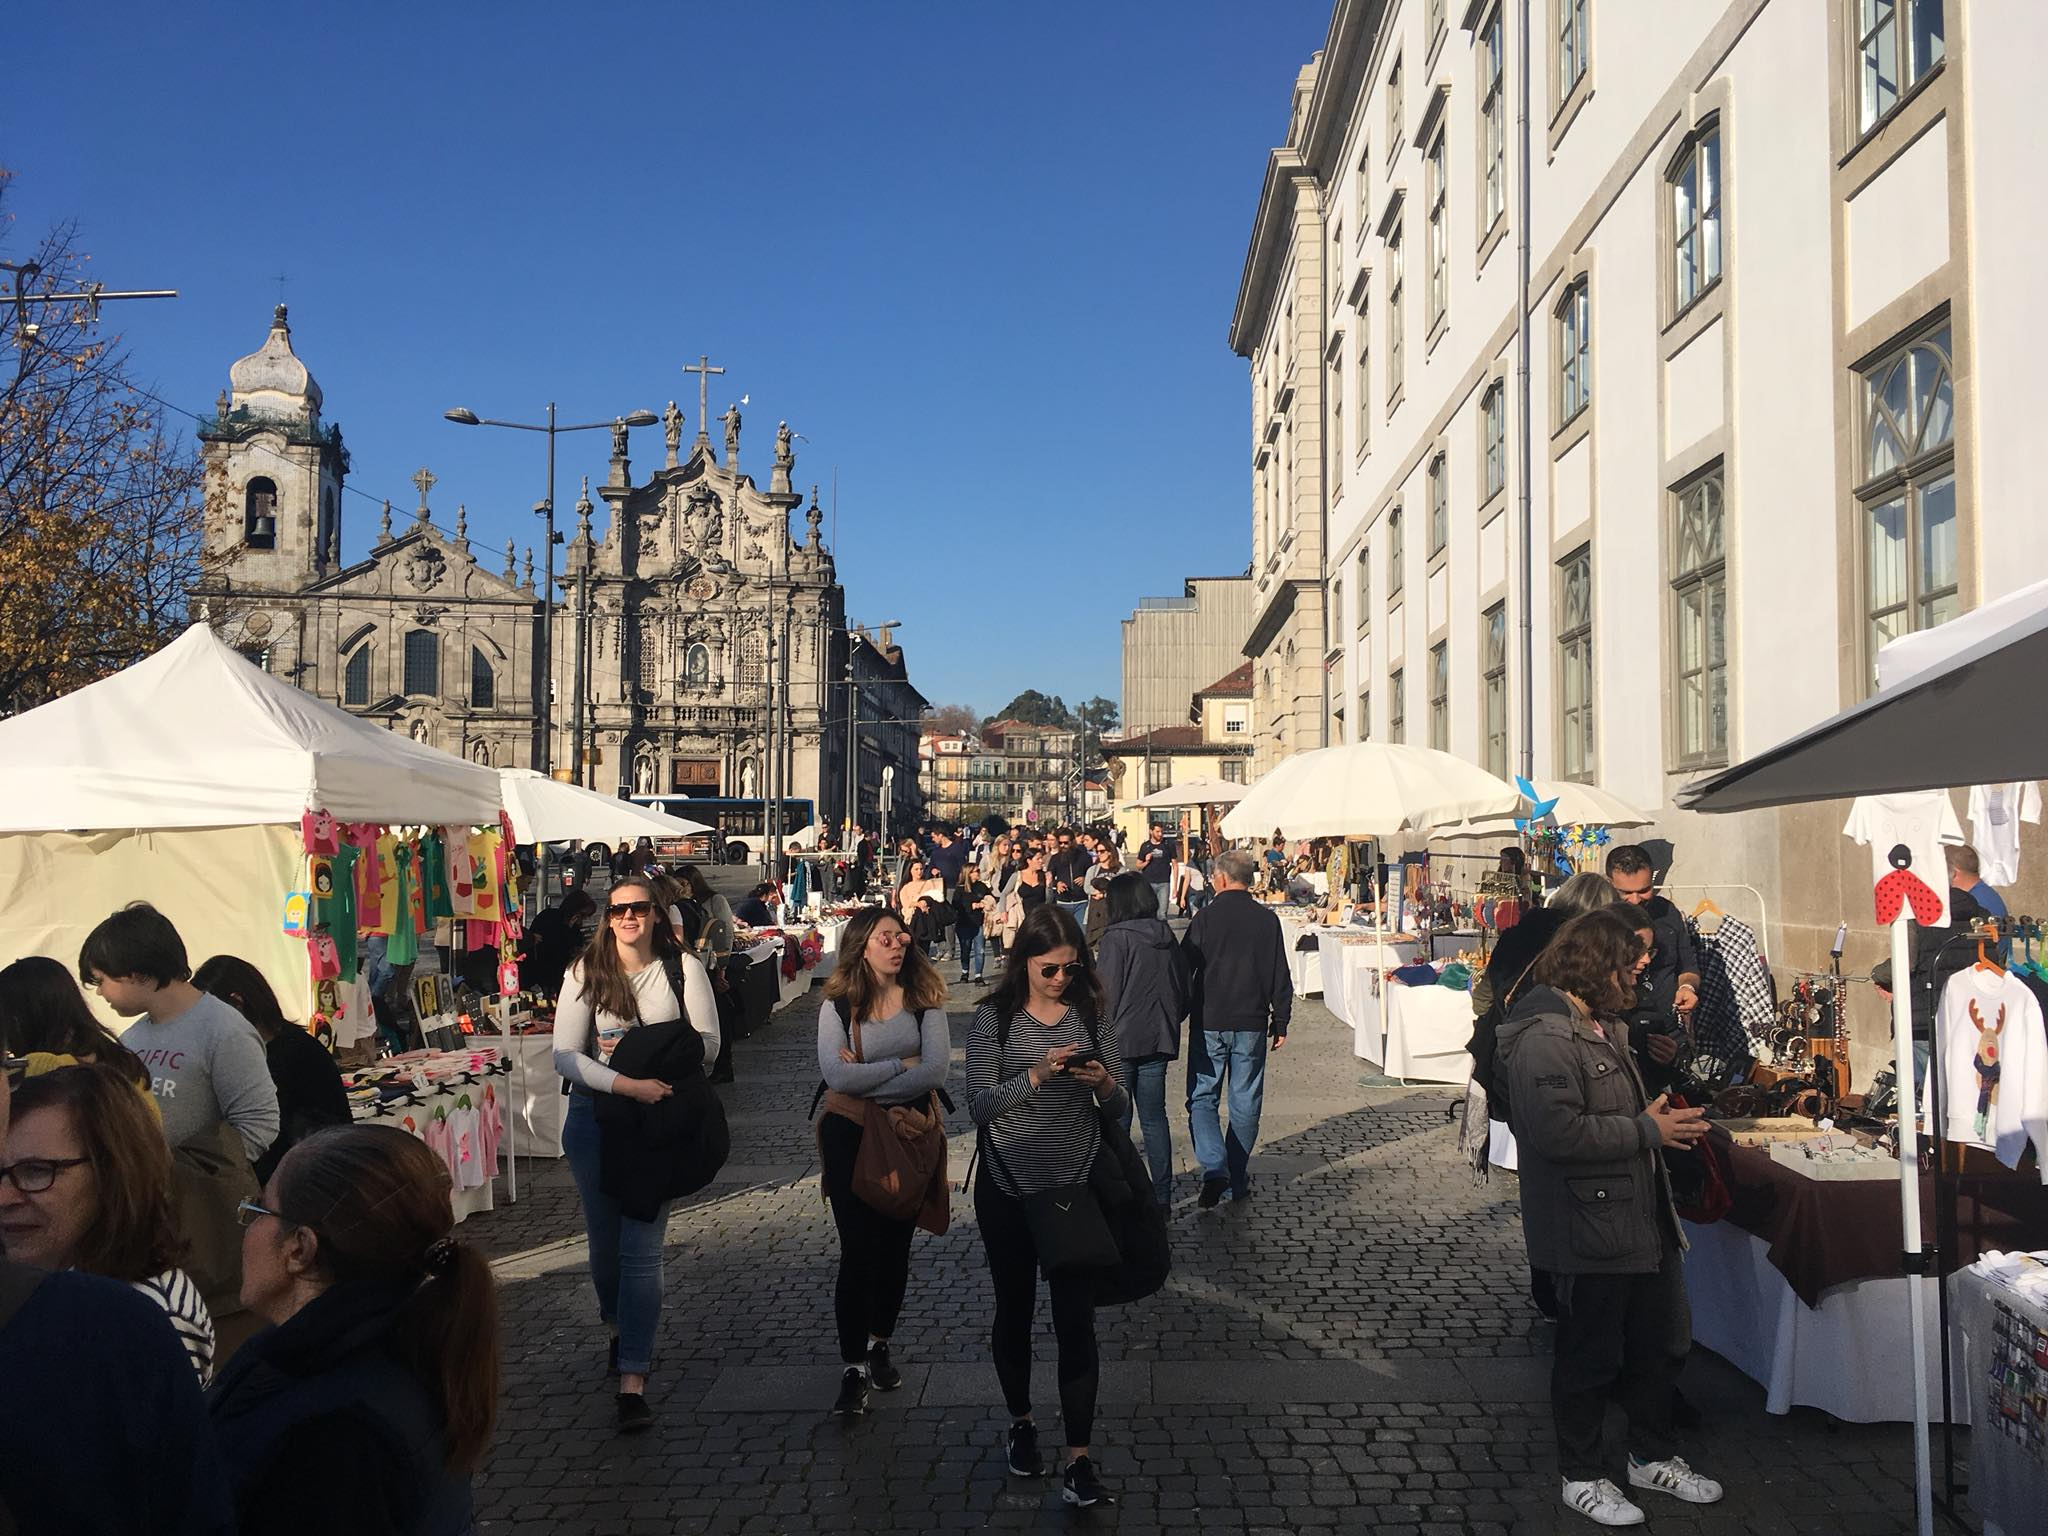 Marche artisanat - Mercado artesanato - Porto